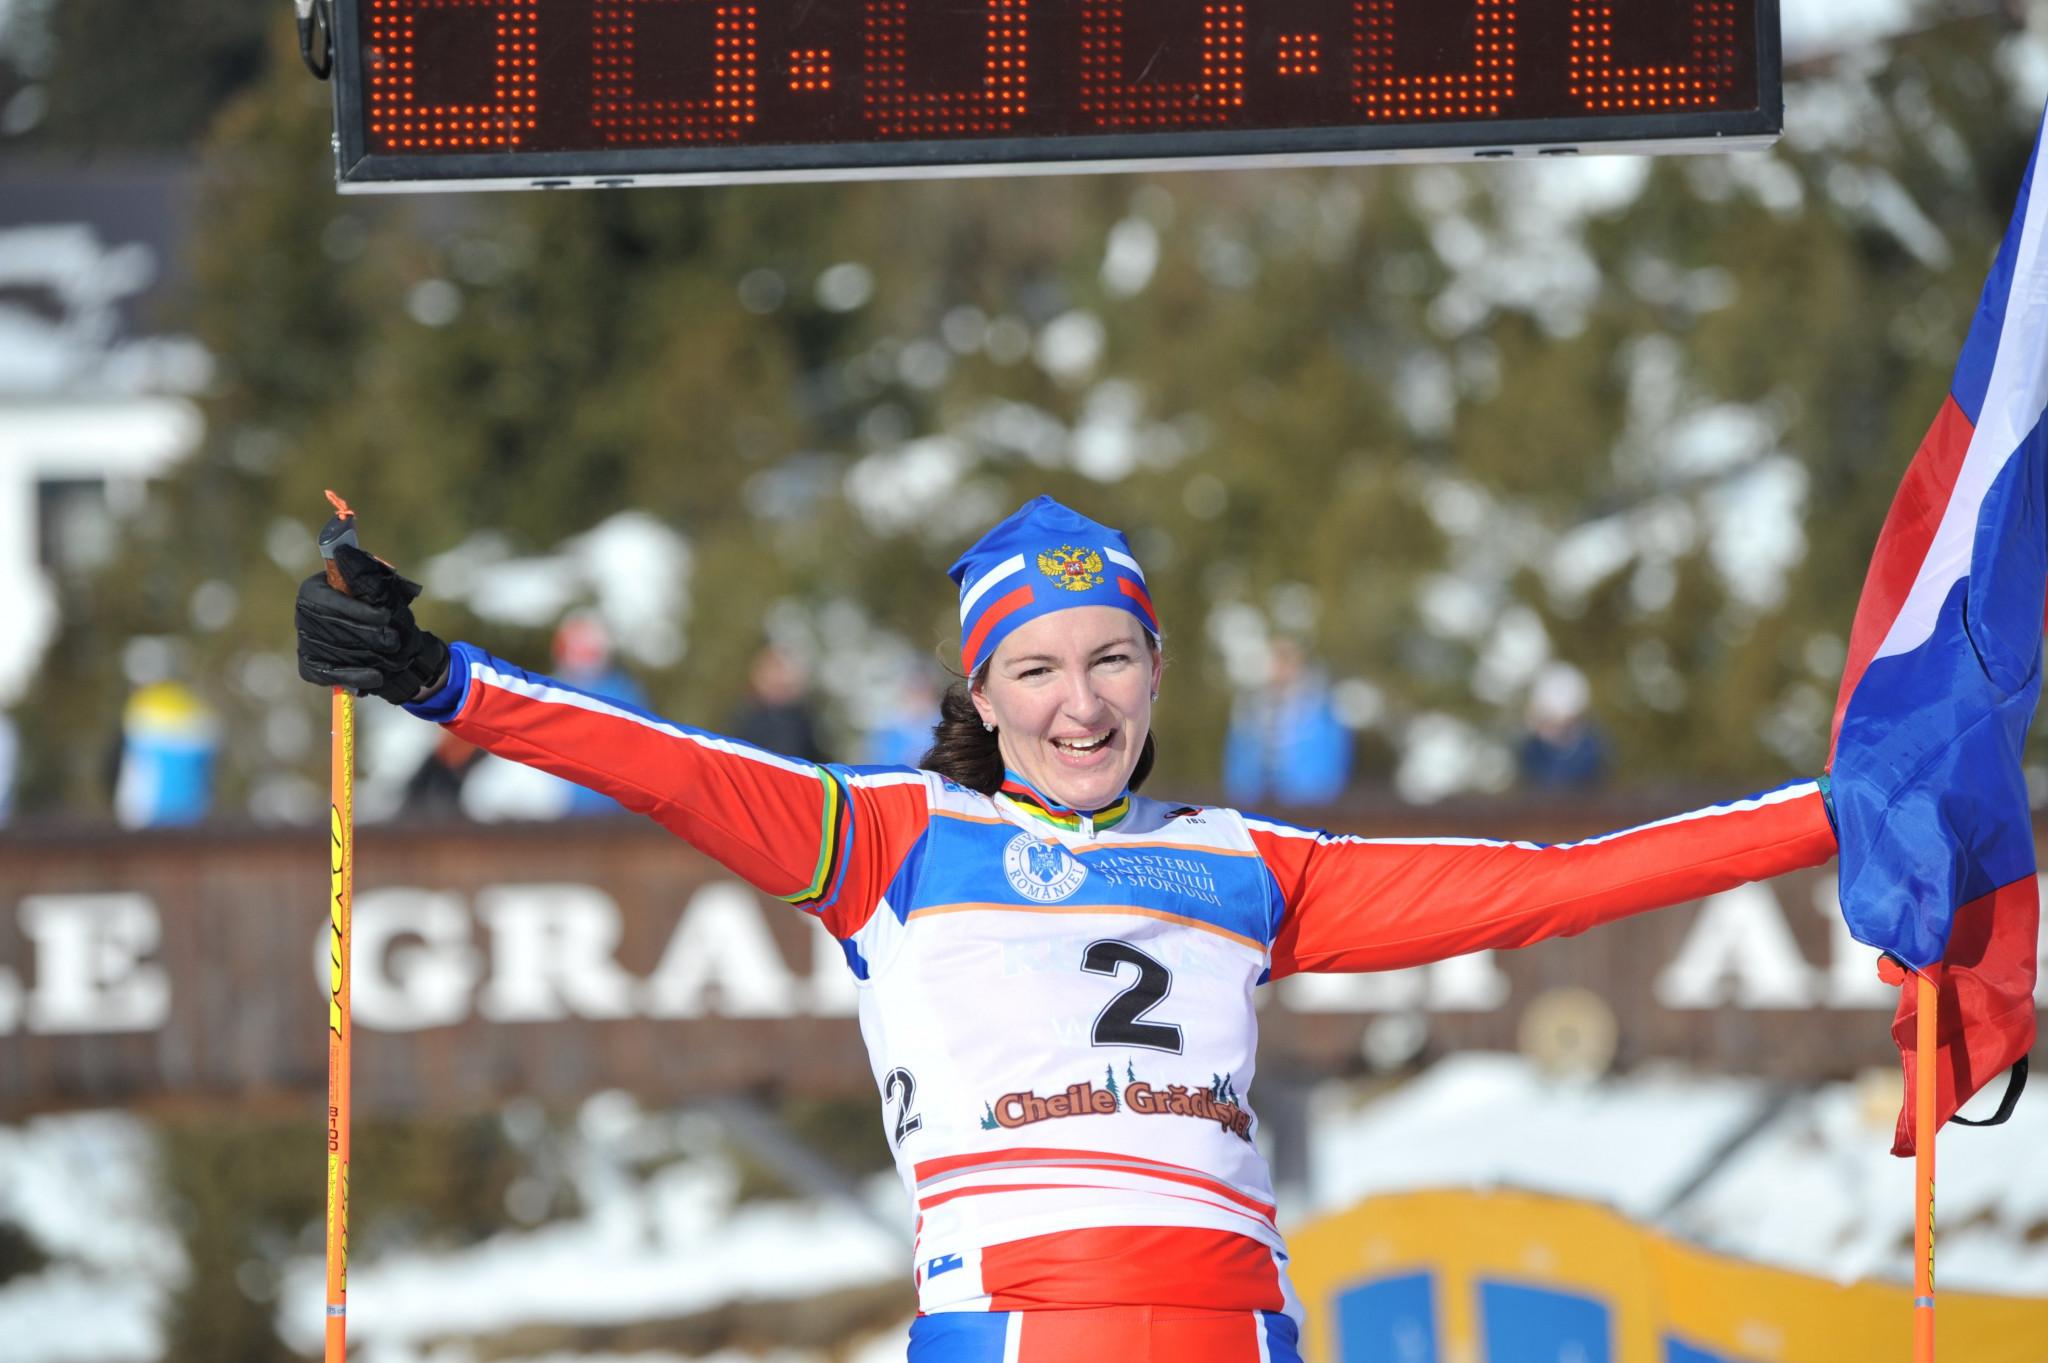 Russians put bite on rivals in Transylvania to win Winter Triathlon World Championships titles